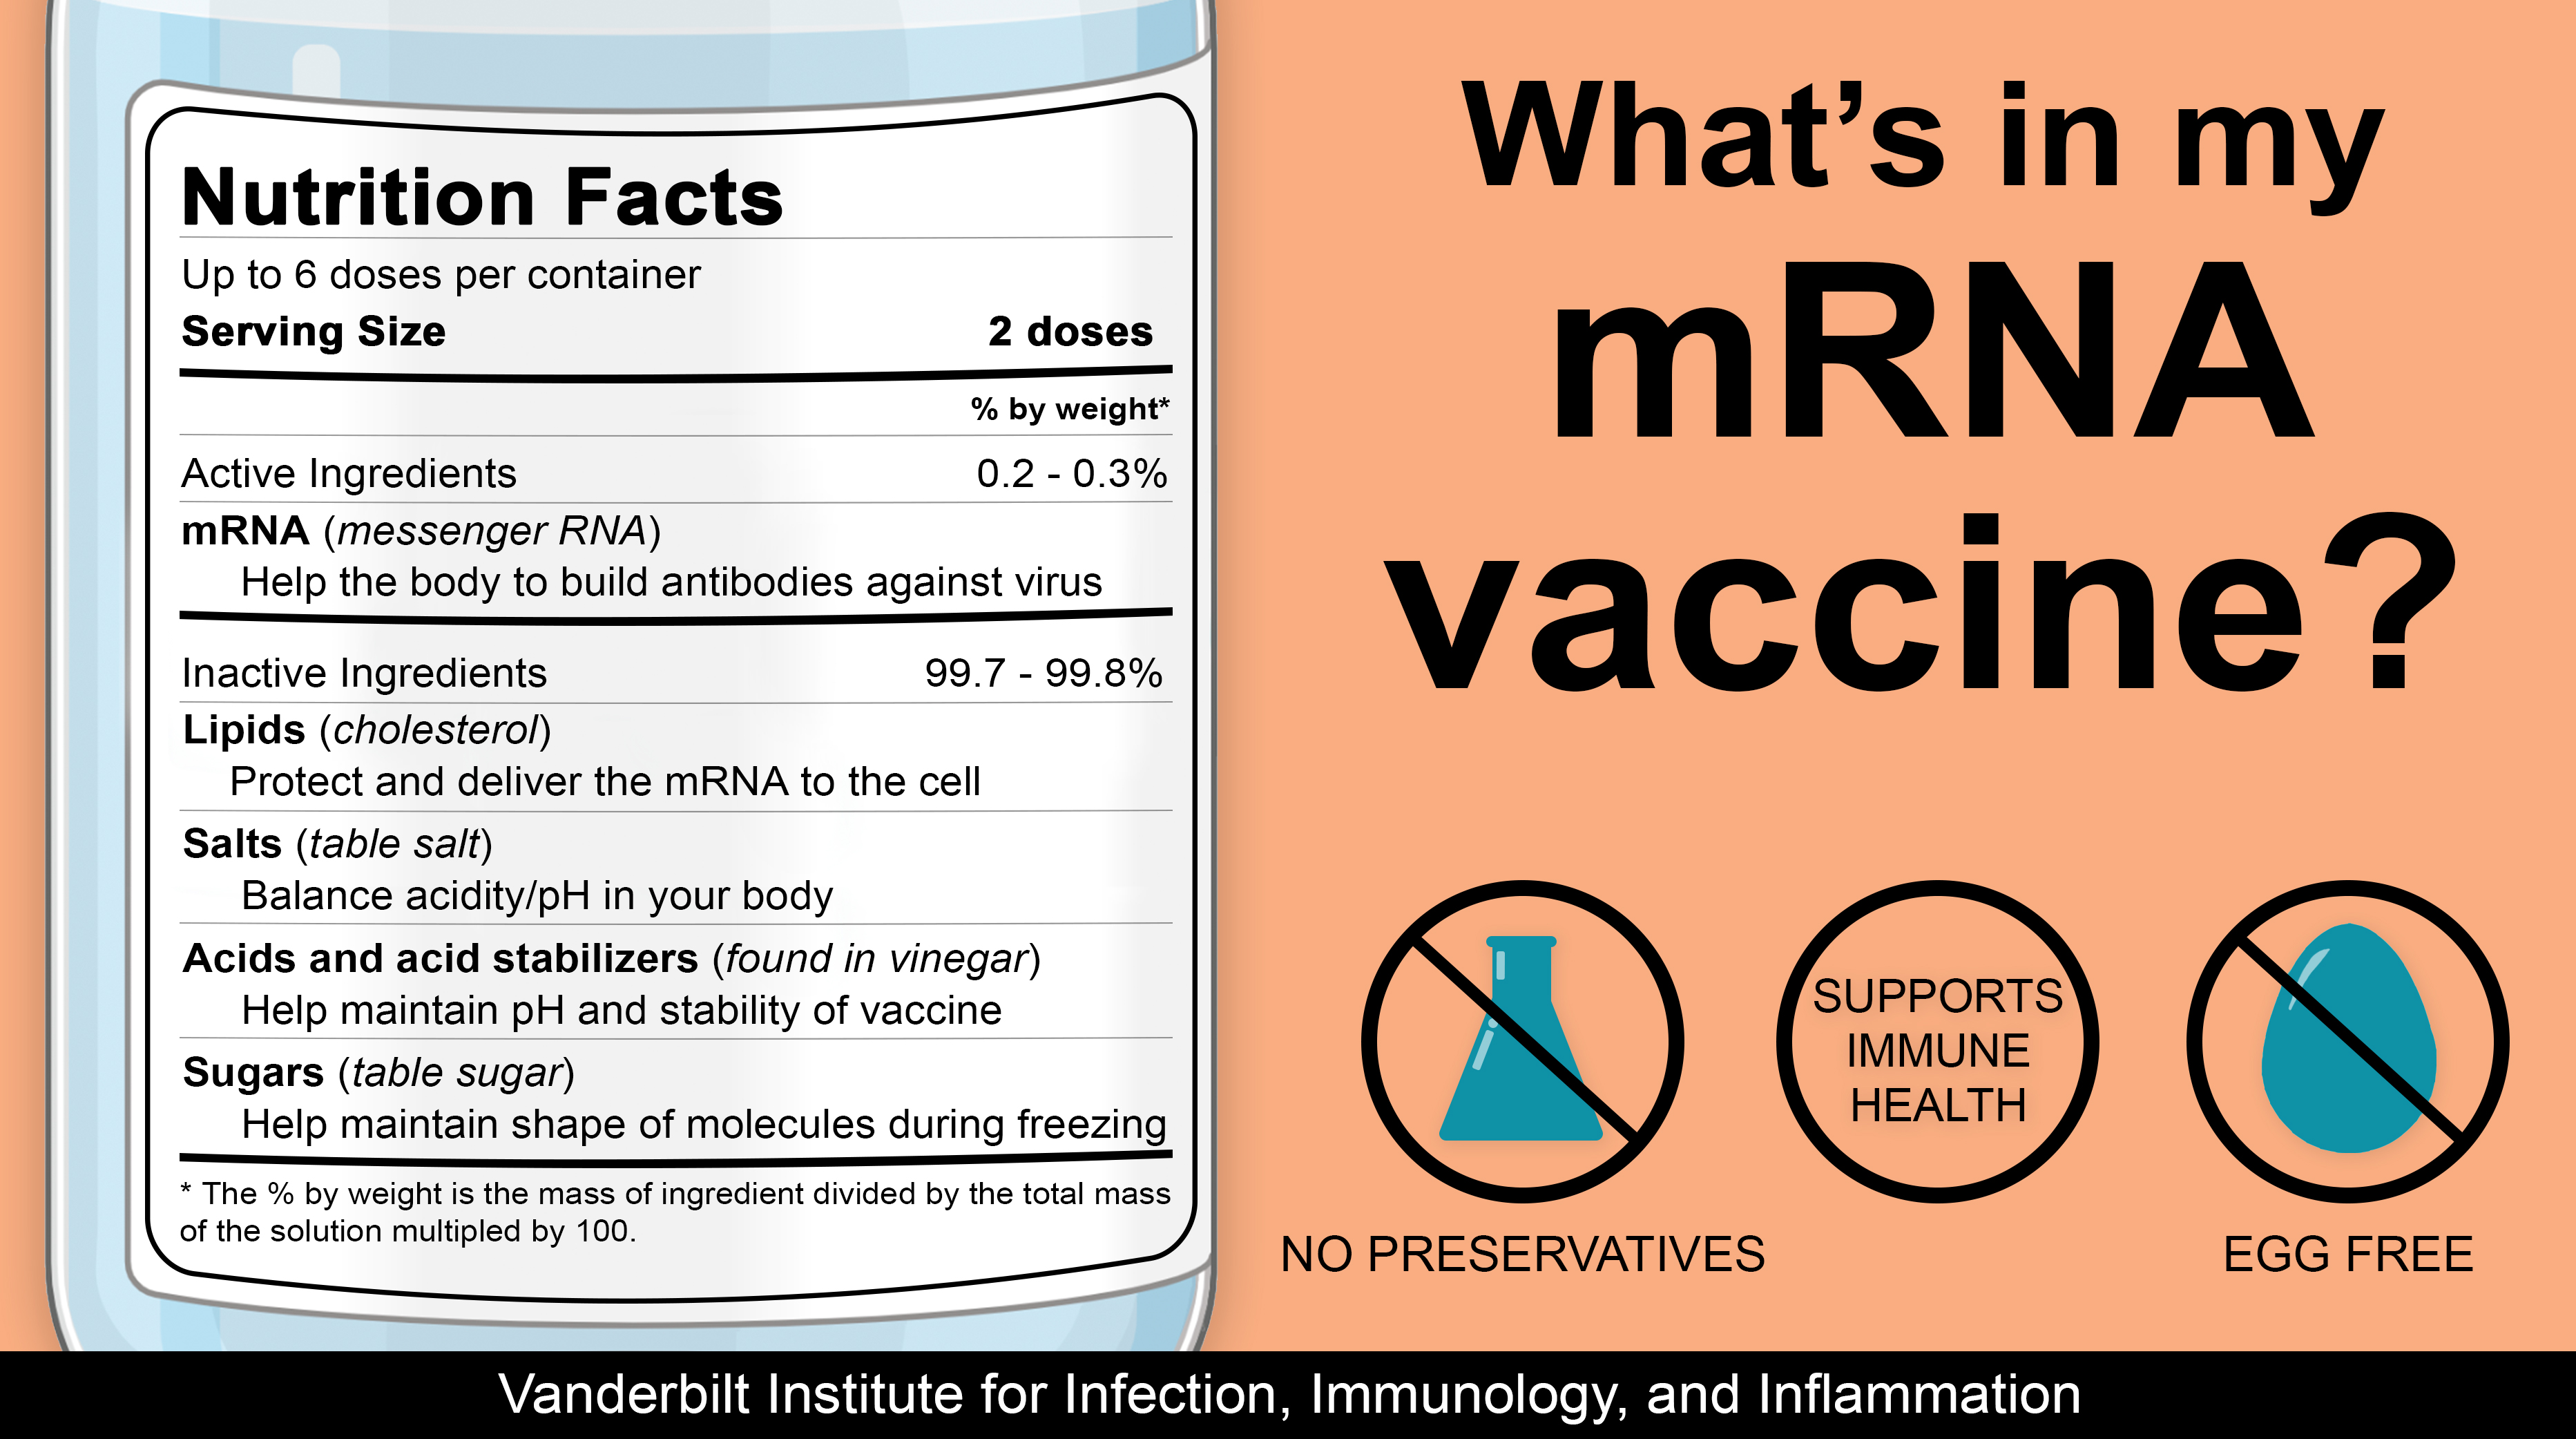 What's in my mRNA vaccine?